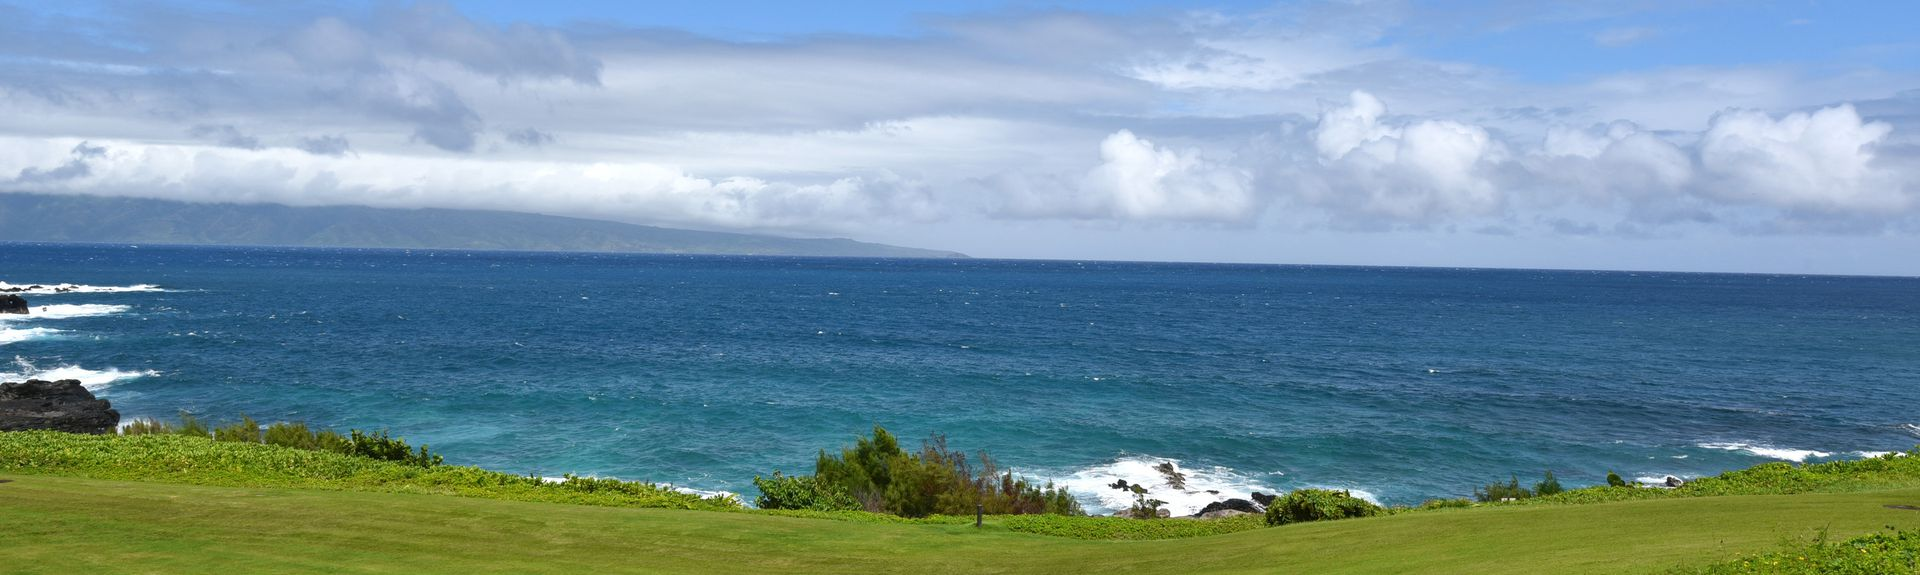 Kapalua Bay Villas, Lahaina, Hawaii, United States of America